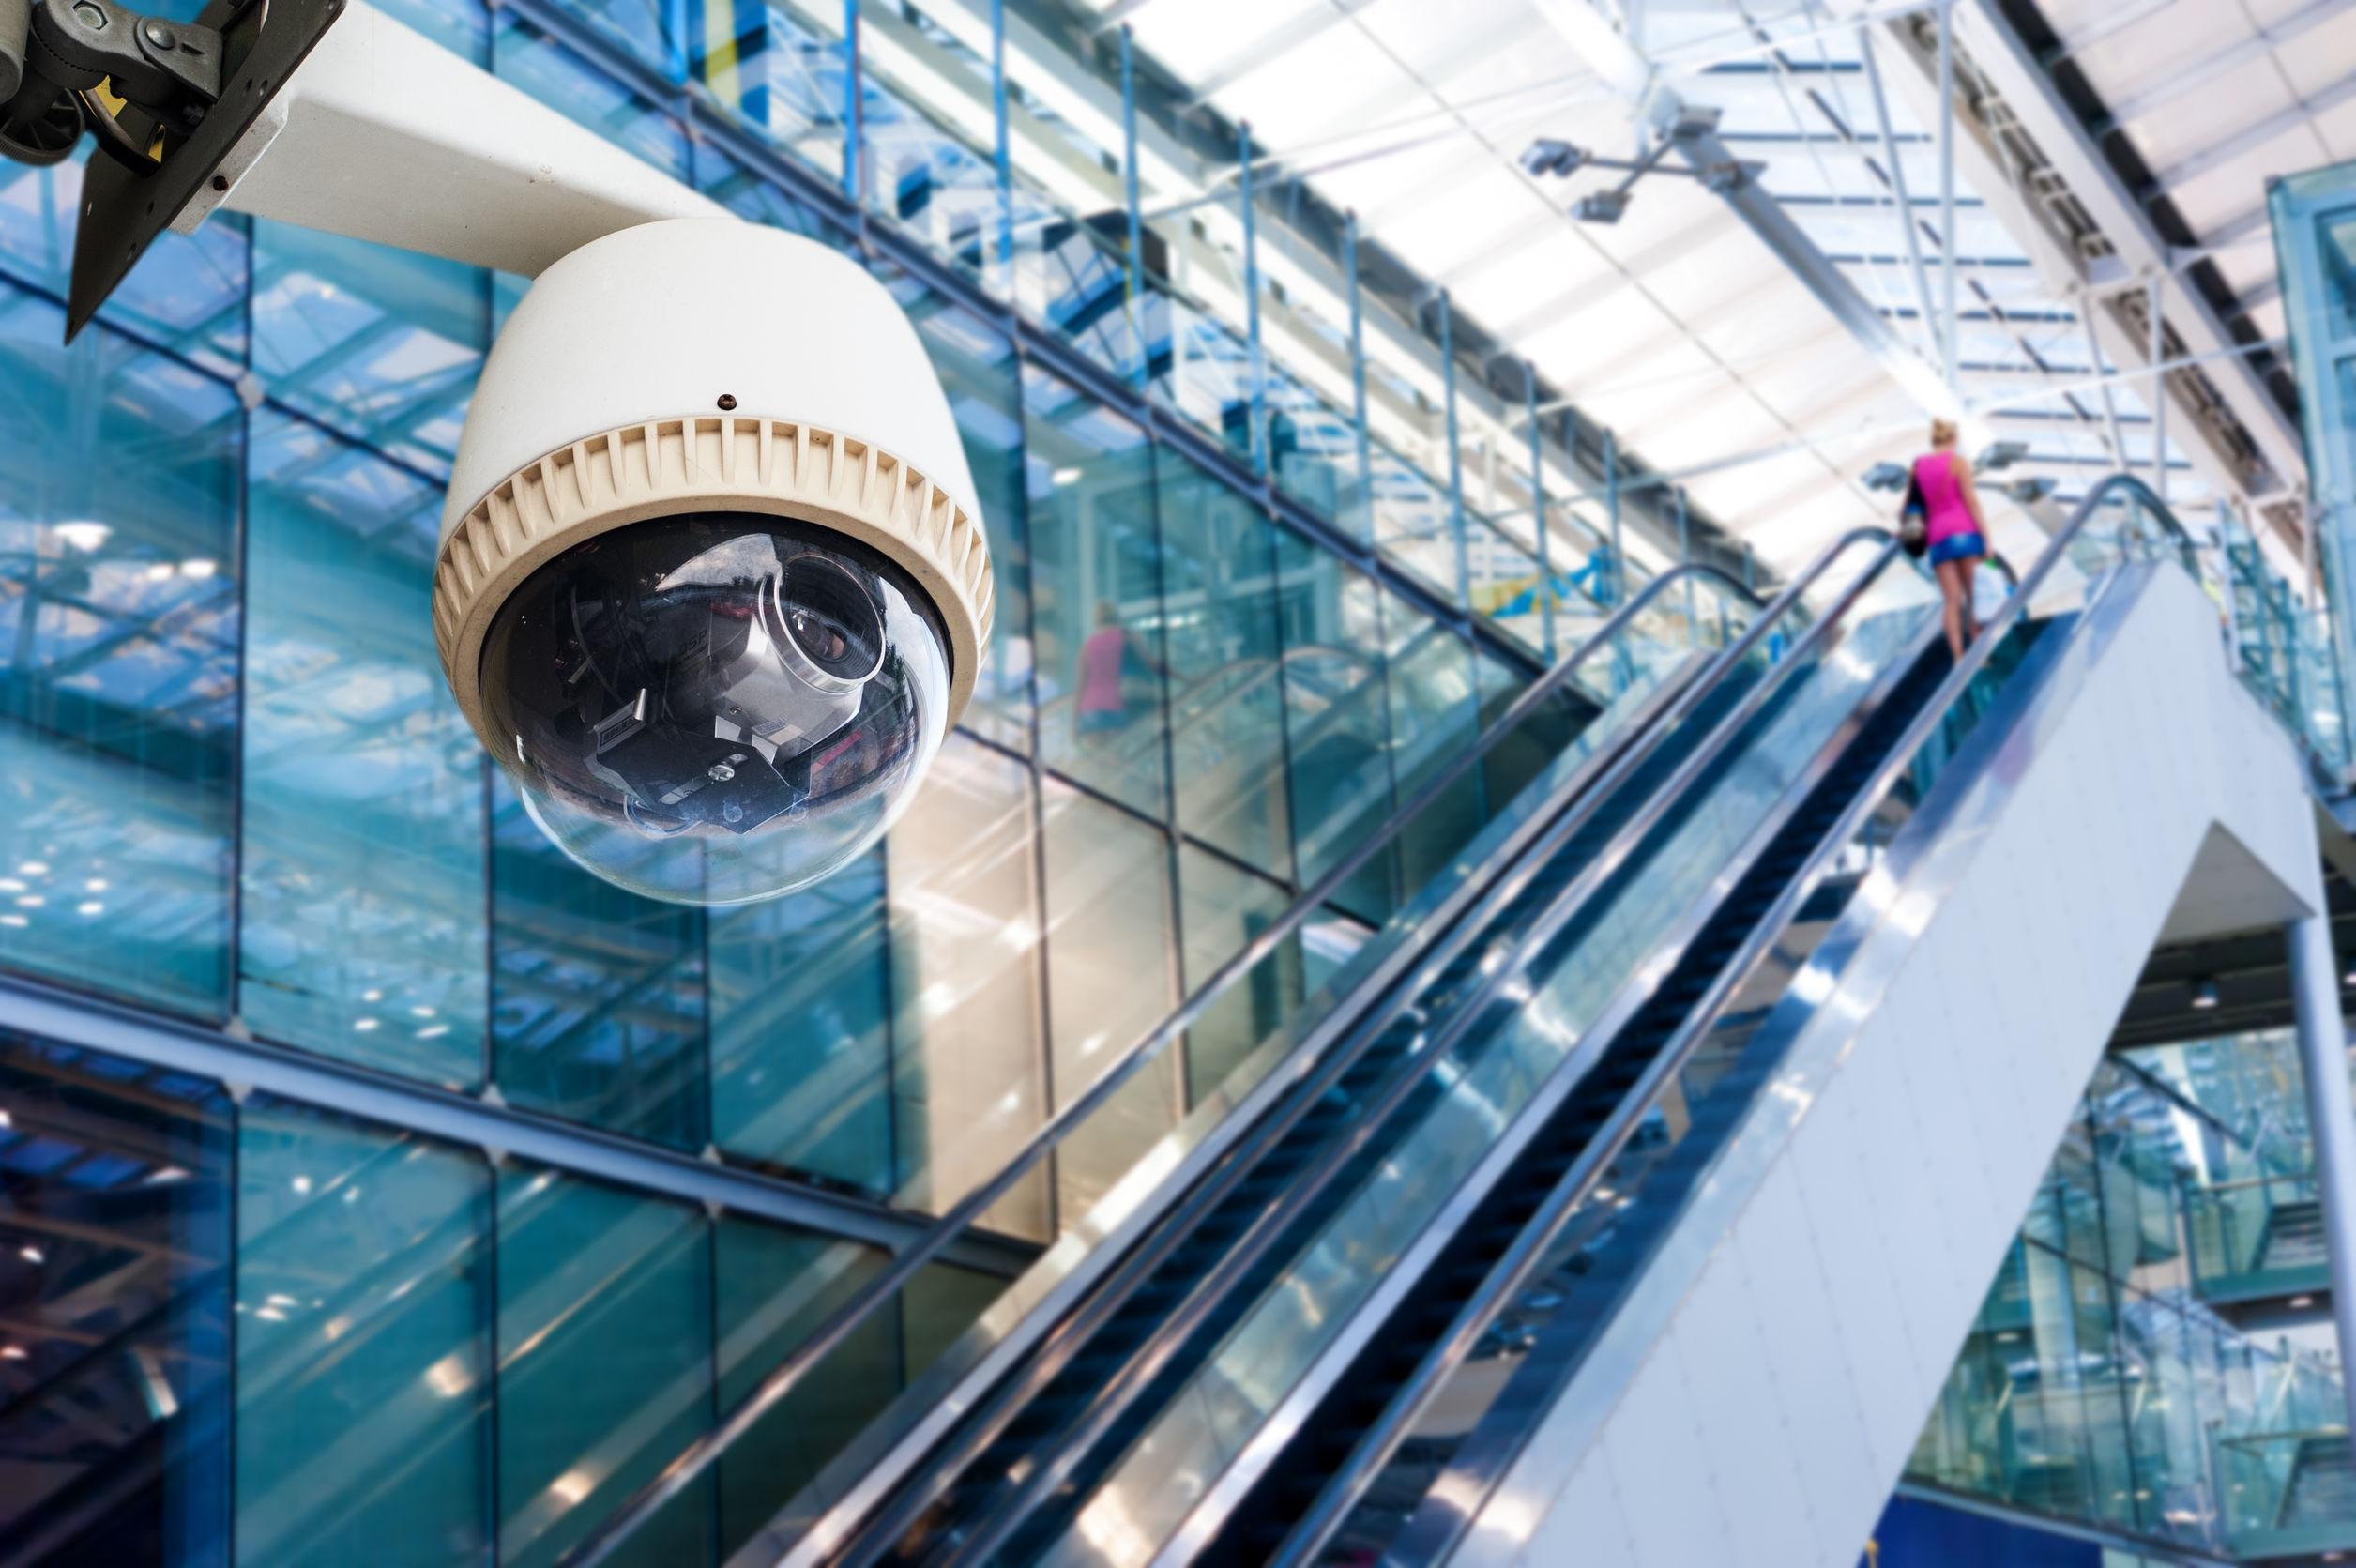 Cctv Installation Bromley 166 Intruder Alarms Uc Cctv